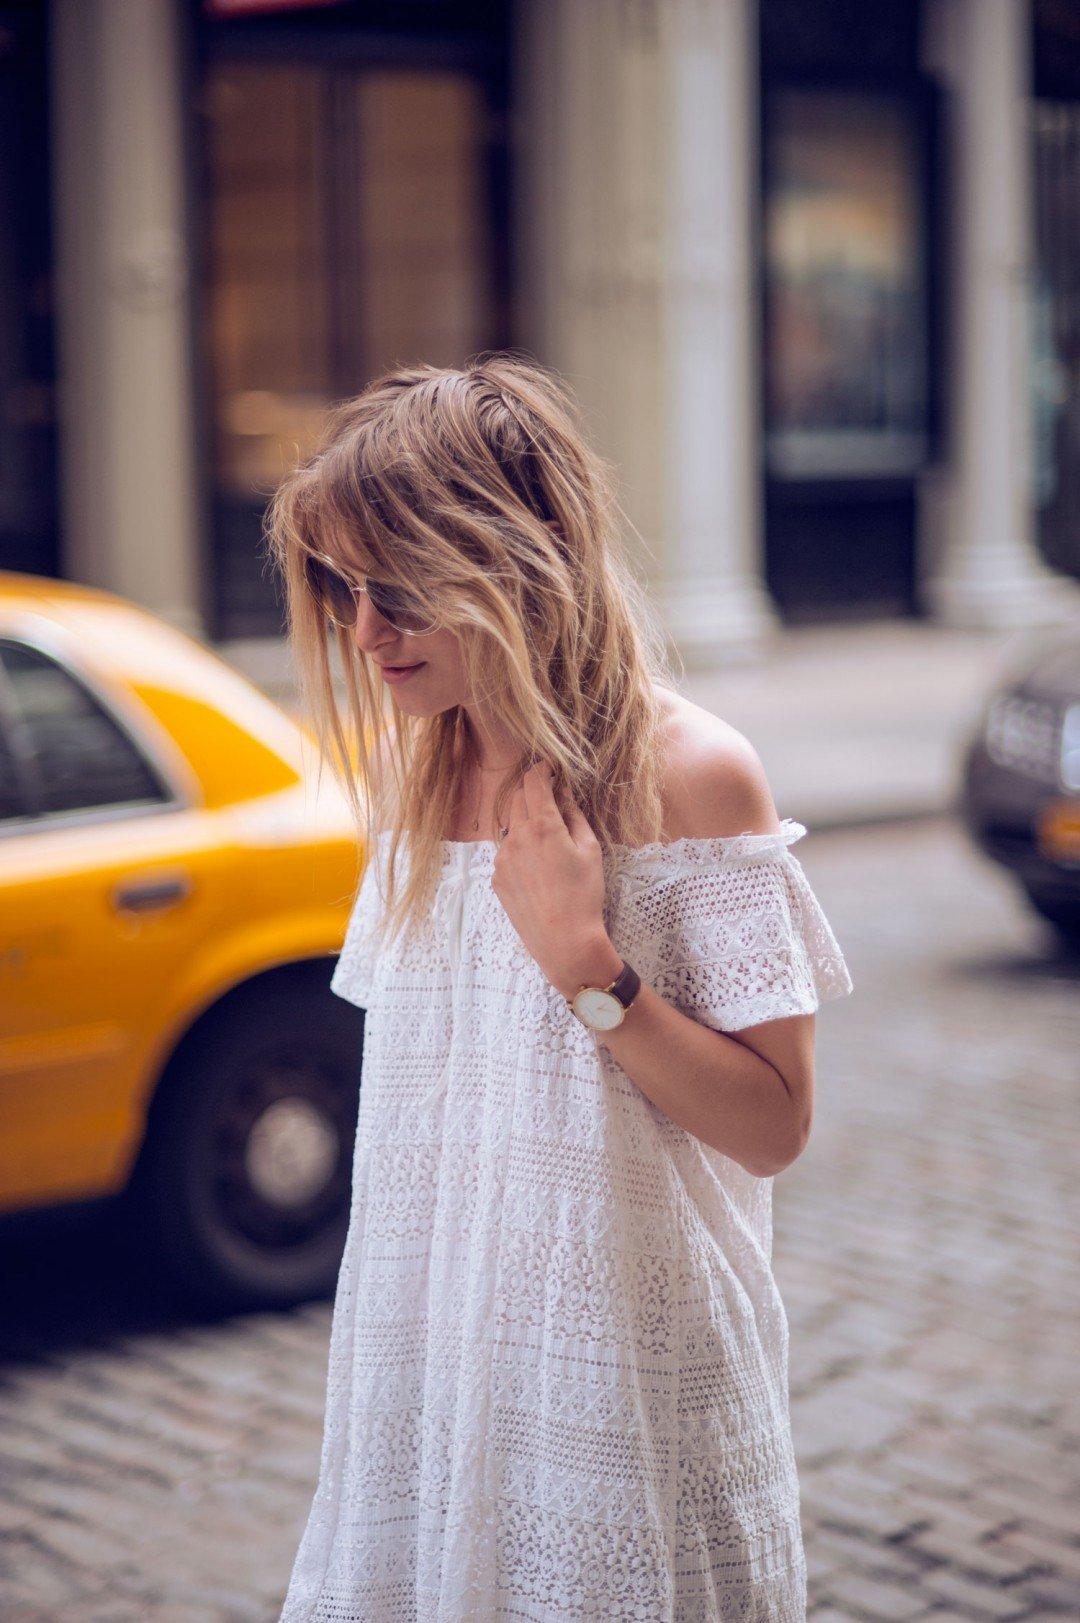 new york fashion blogger